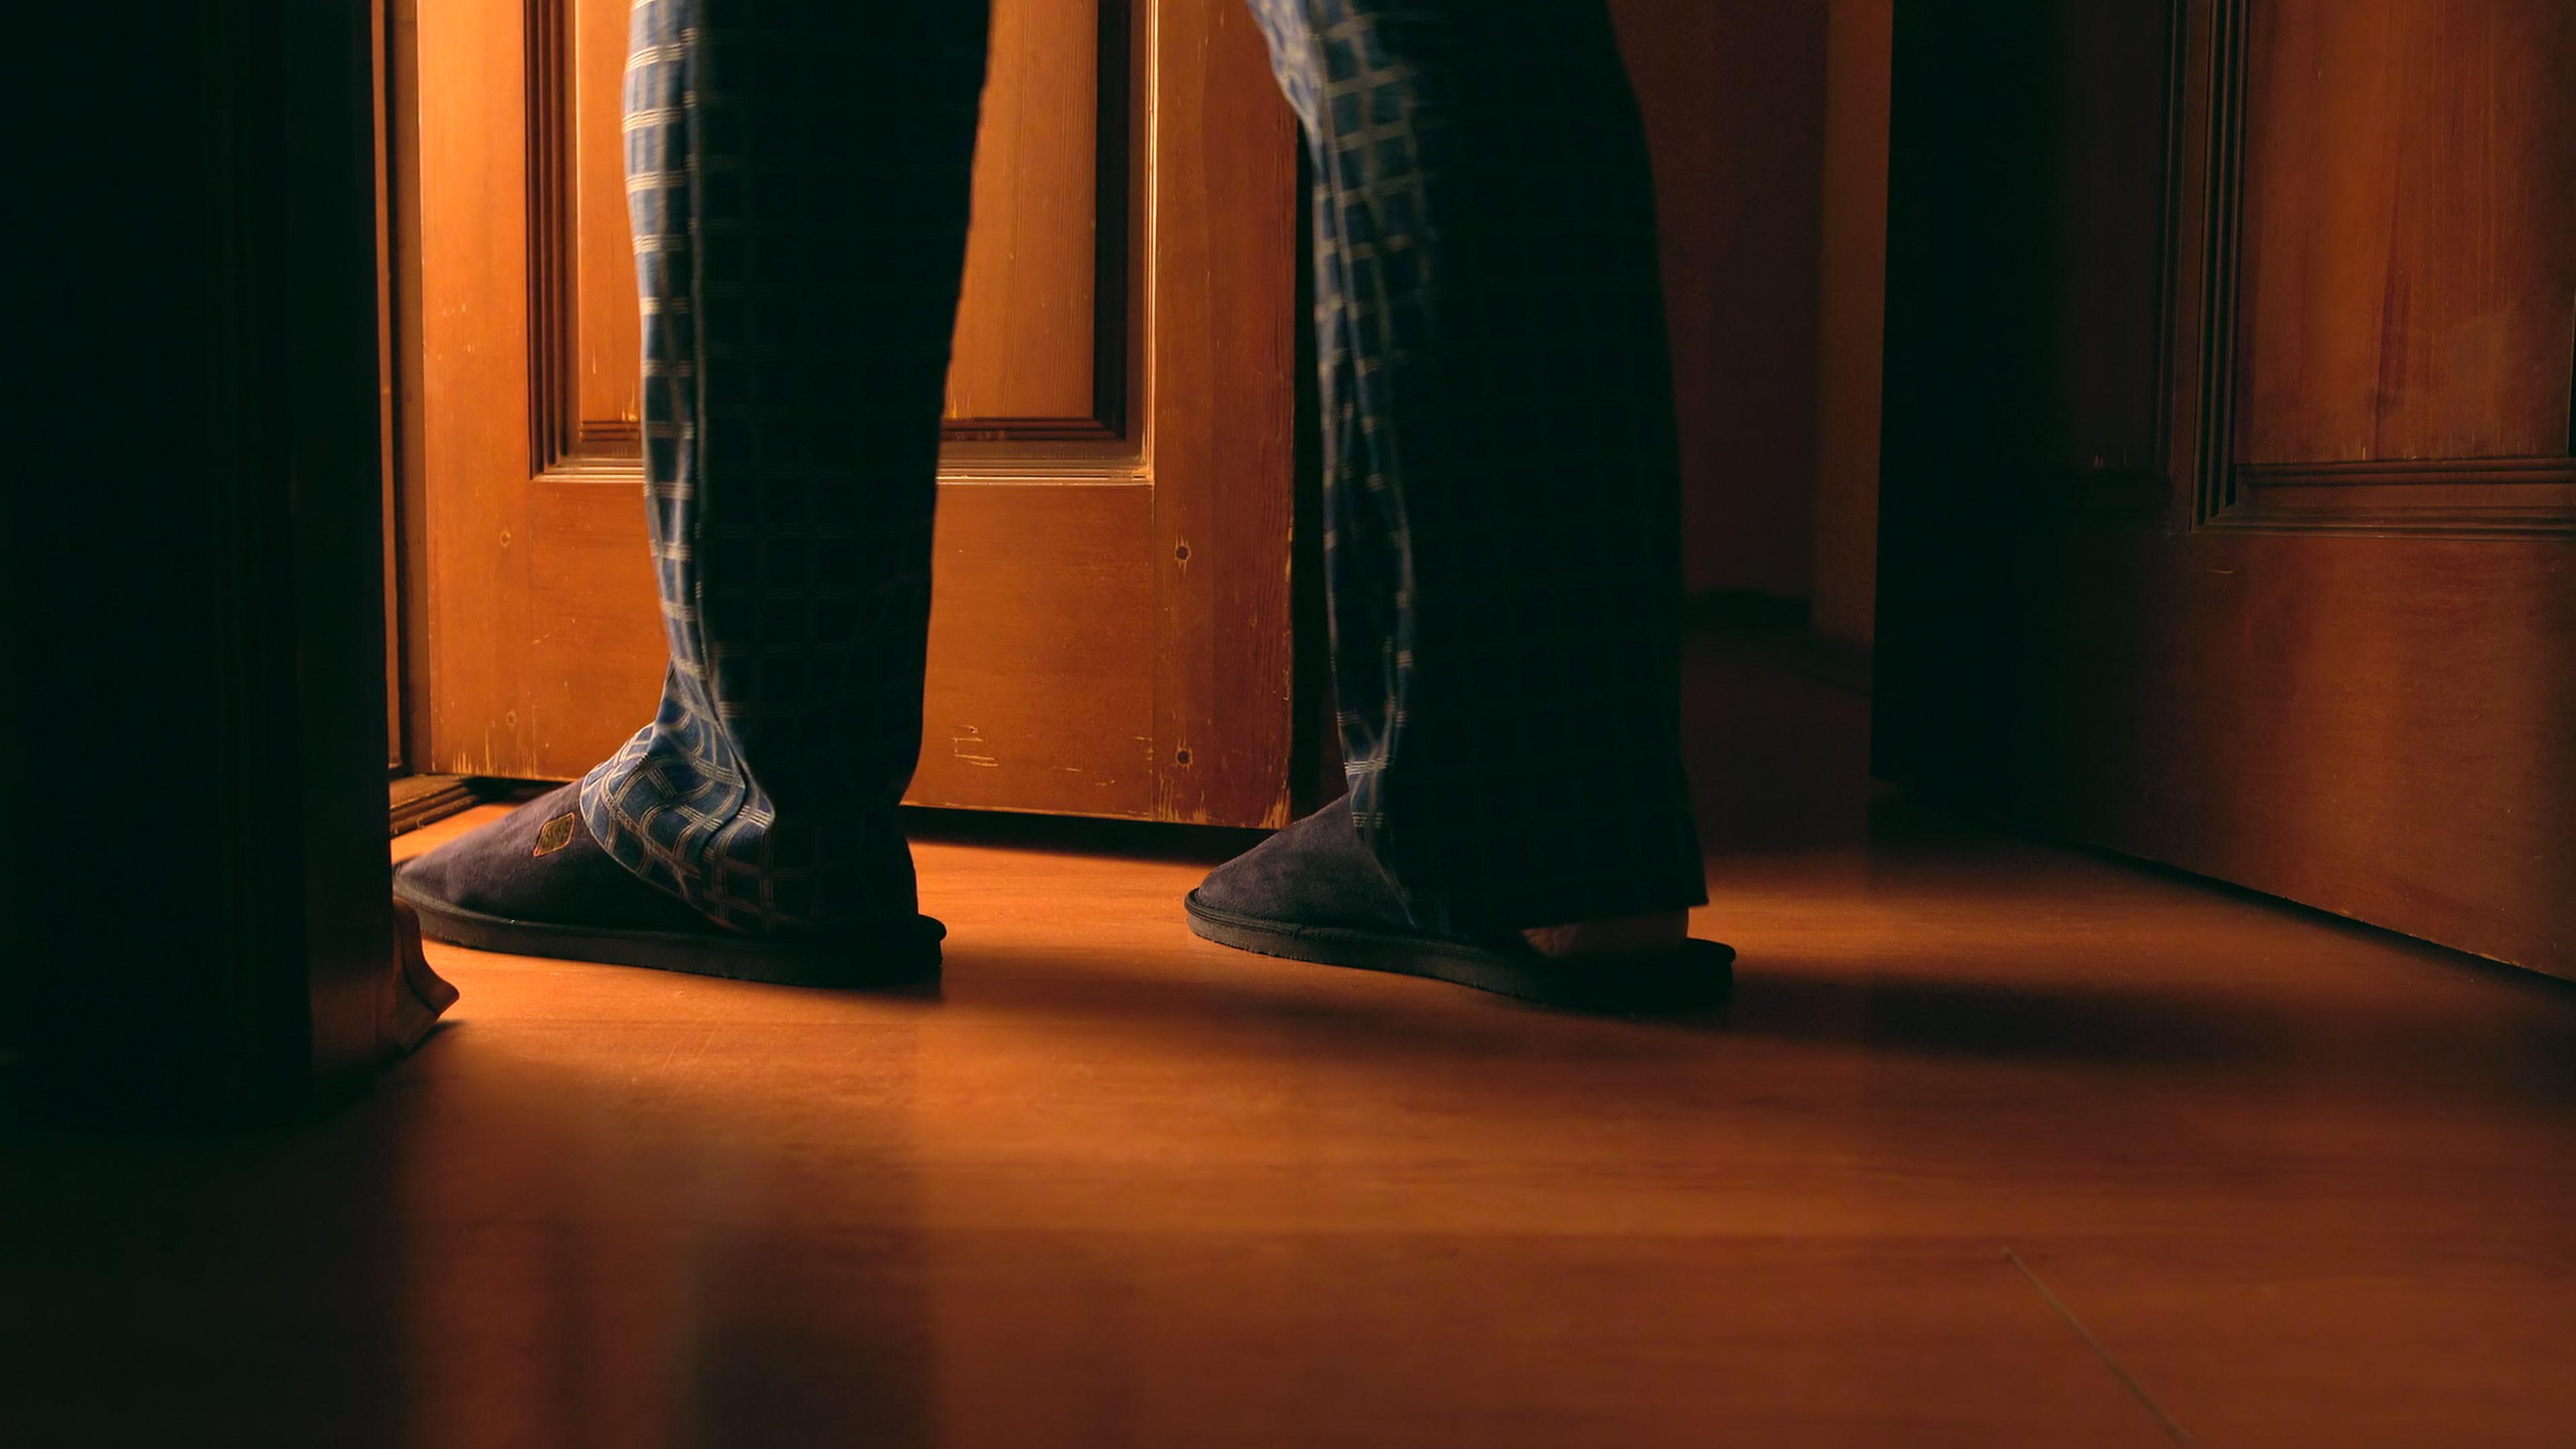 Adult man walks to a bathroom at the night elderly